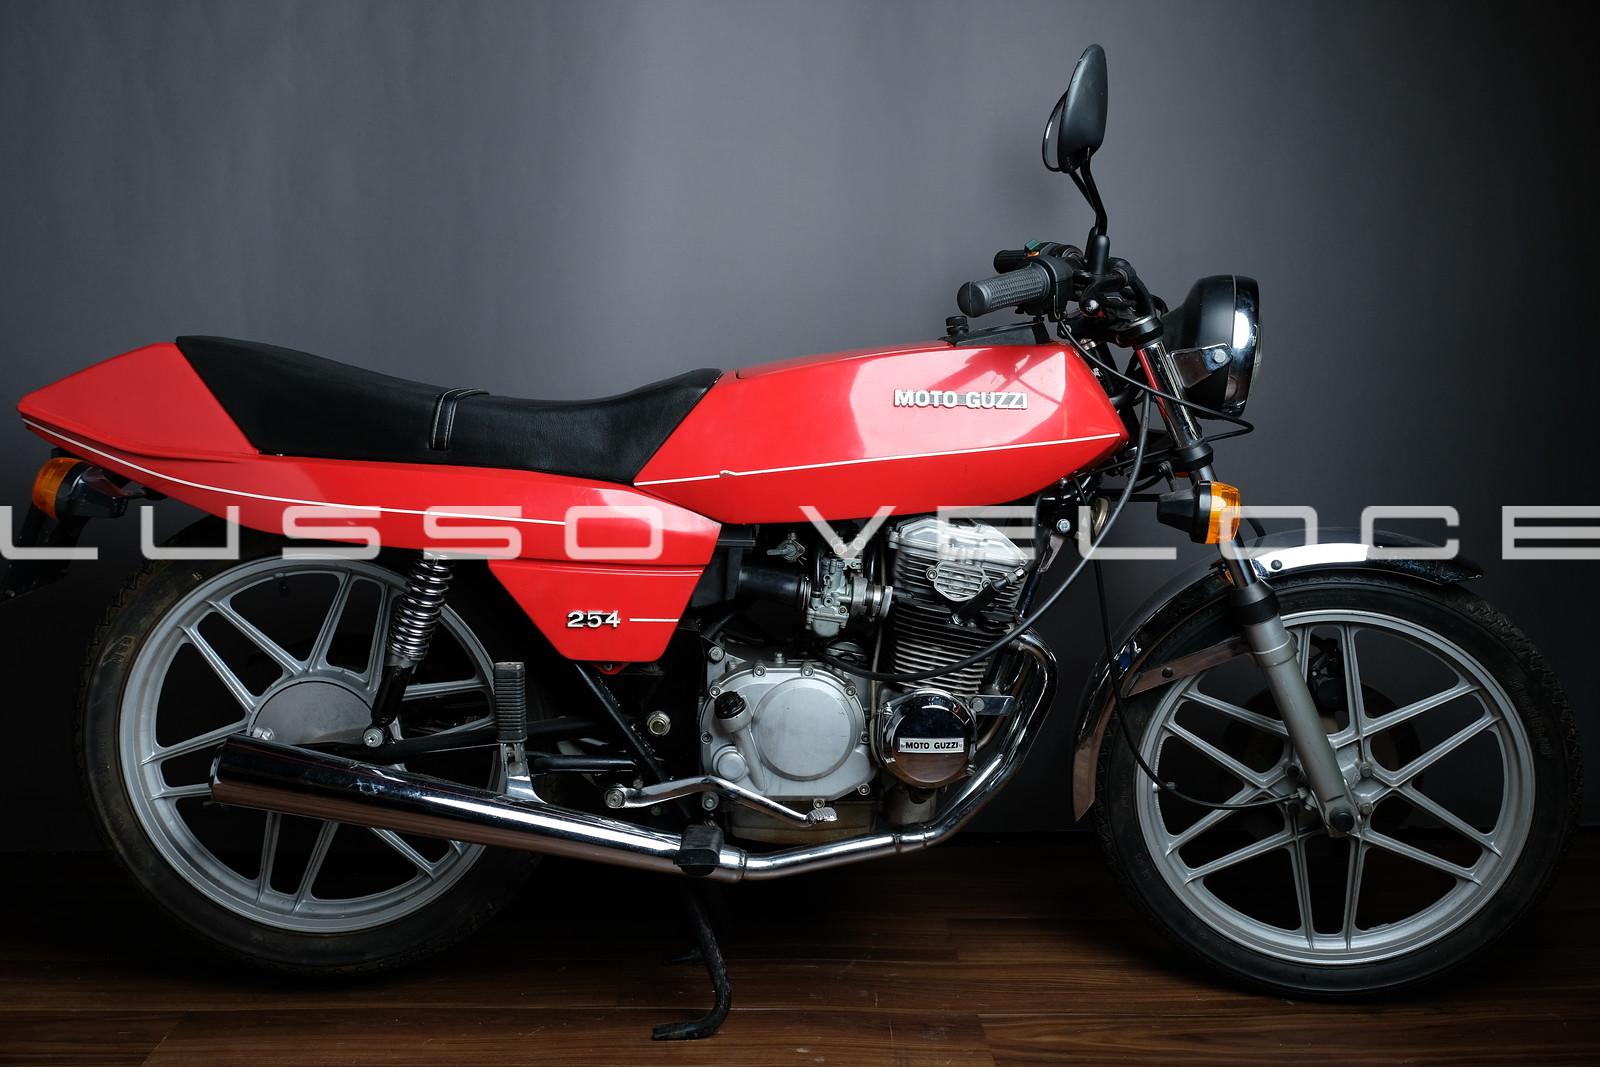 Moto Guzzi 254